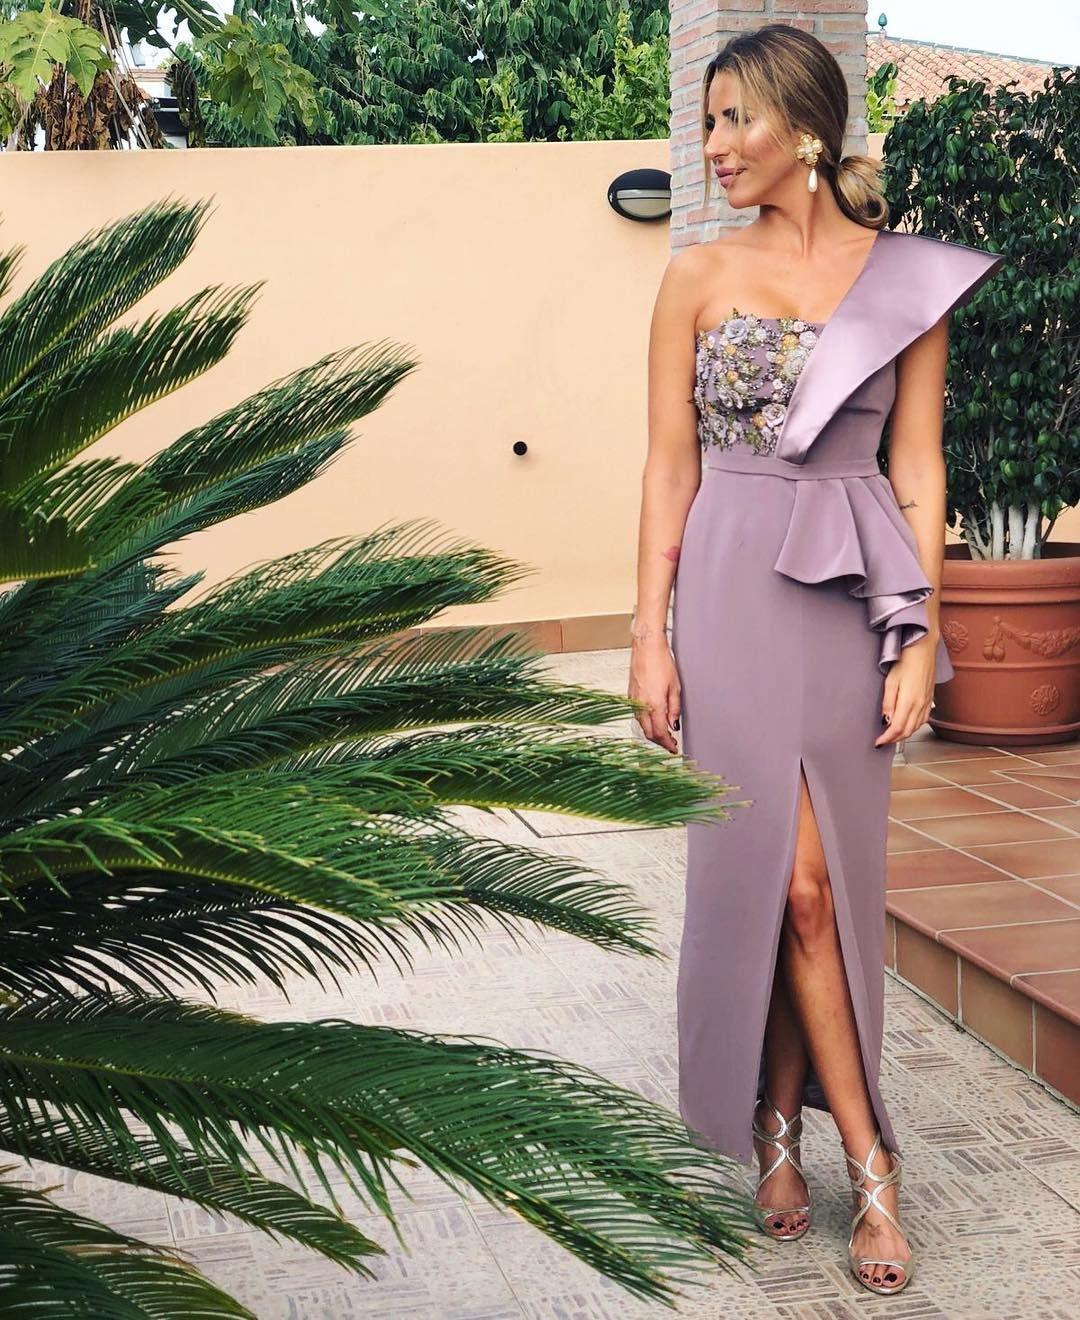 Atelier Fernando Claro On Instagram Ana Fernandoclarocouture Hautecouture Altacostura Madeinspa Fashion Dresses Couture Fashion African Fashion Dresses